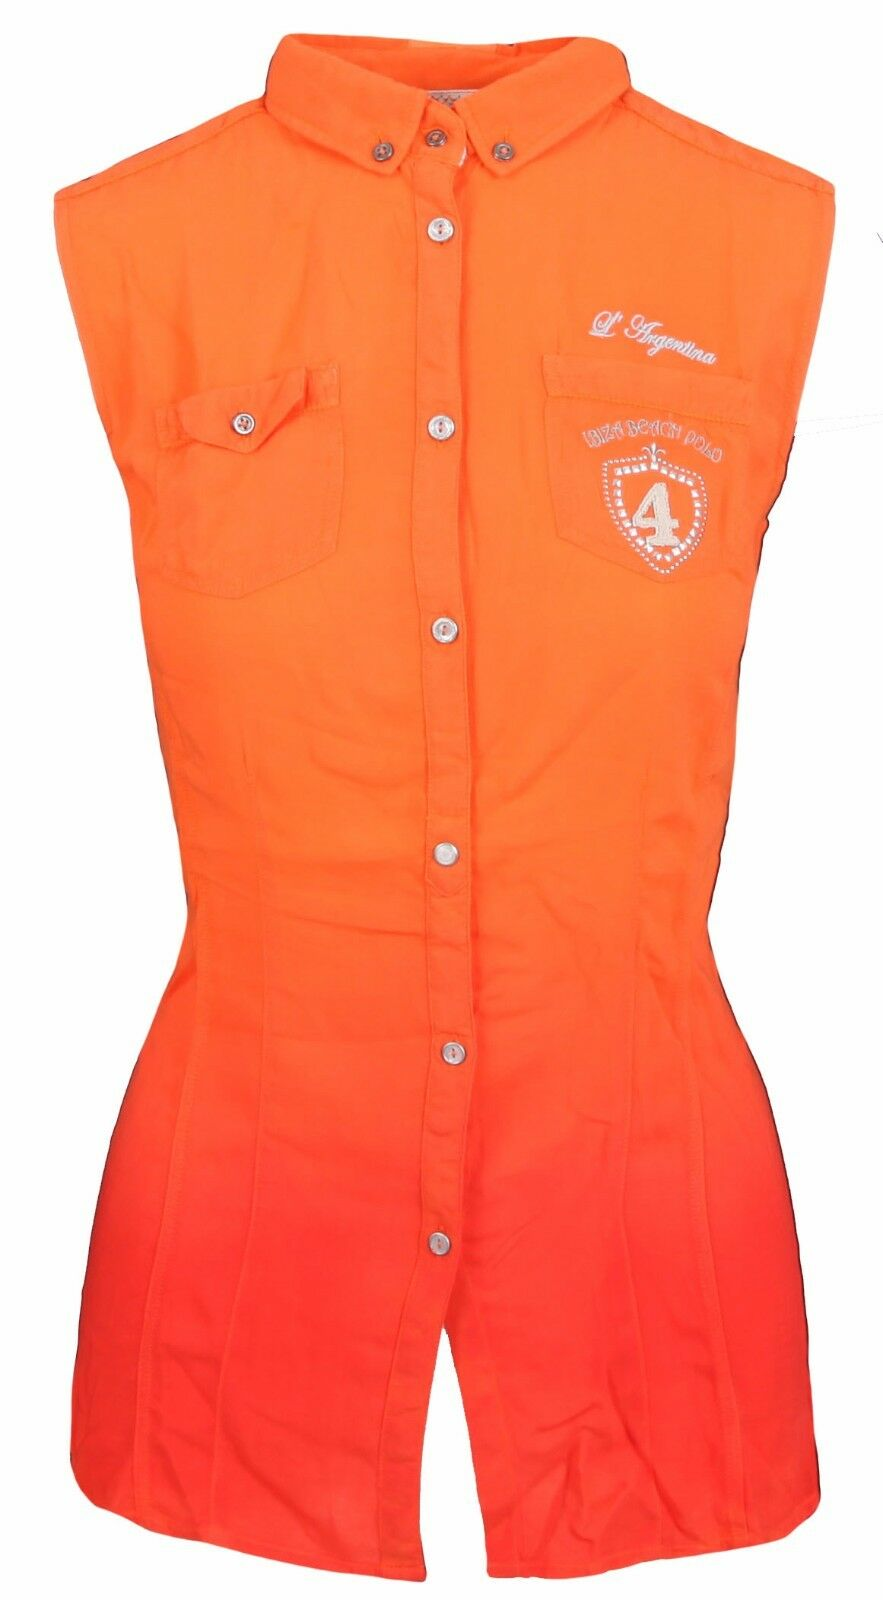 L' SilberINA Damen Blause damen Shirt Größe 38 M Ärmellos 100% Viskose Orange Rot